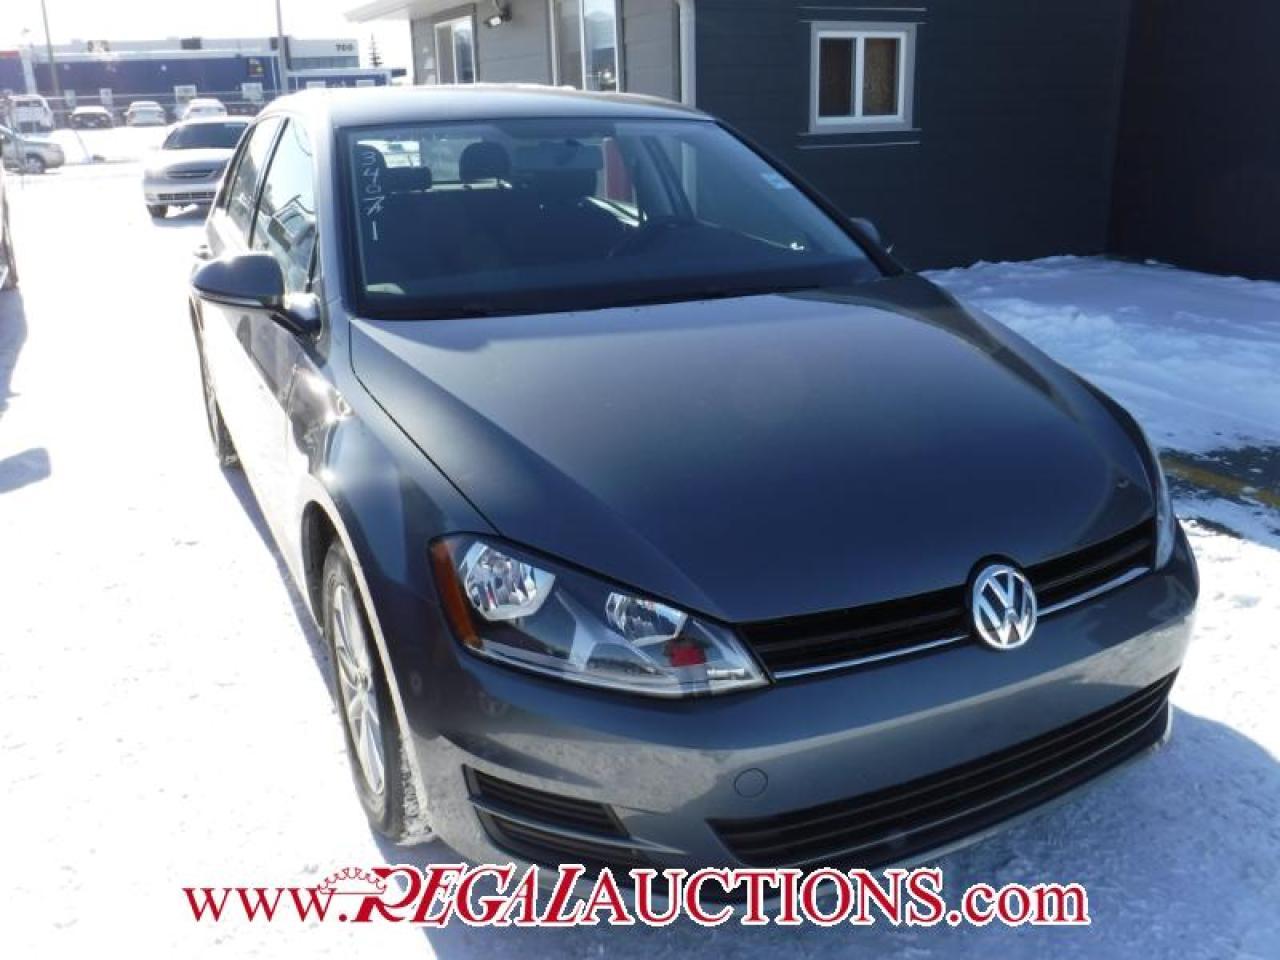 2015 Volkswagen GOLF  5D HBK 1.8 TSI AT